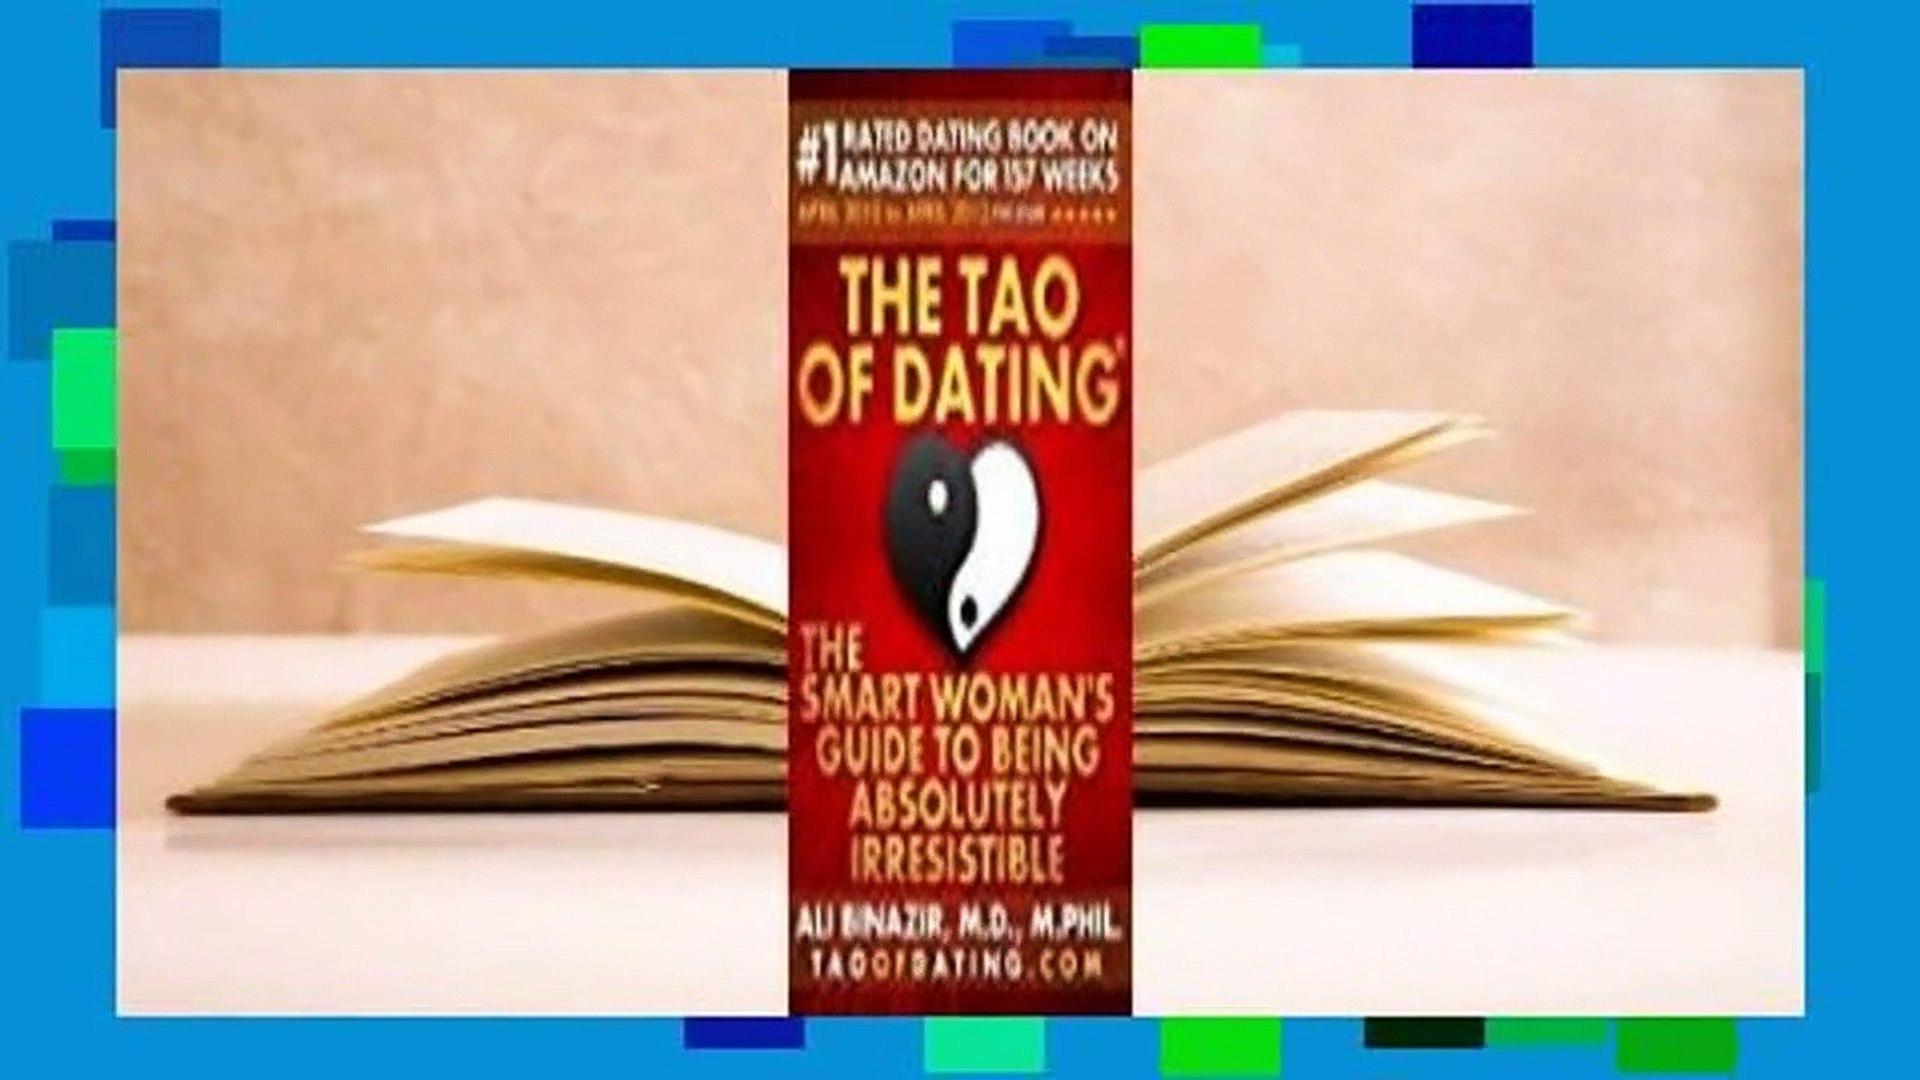 Tao dating